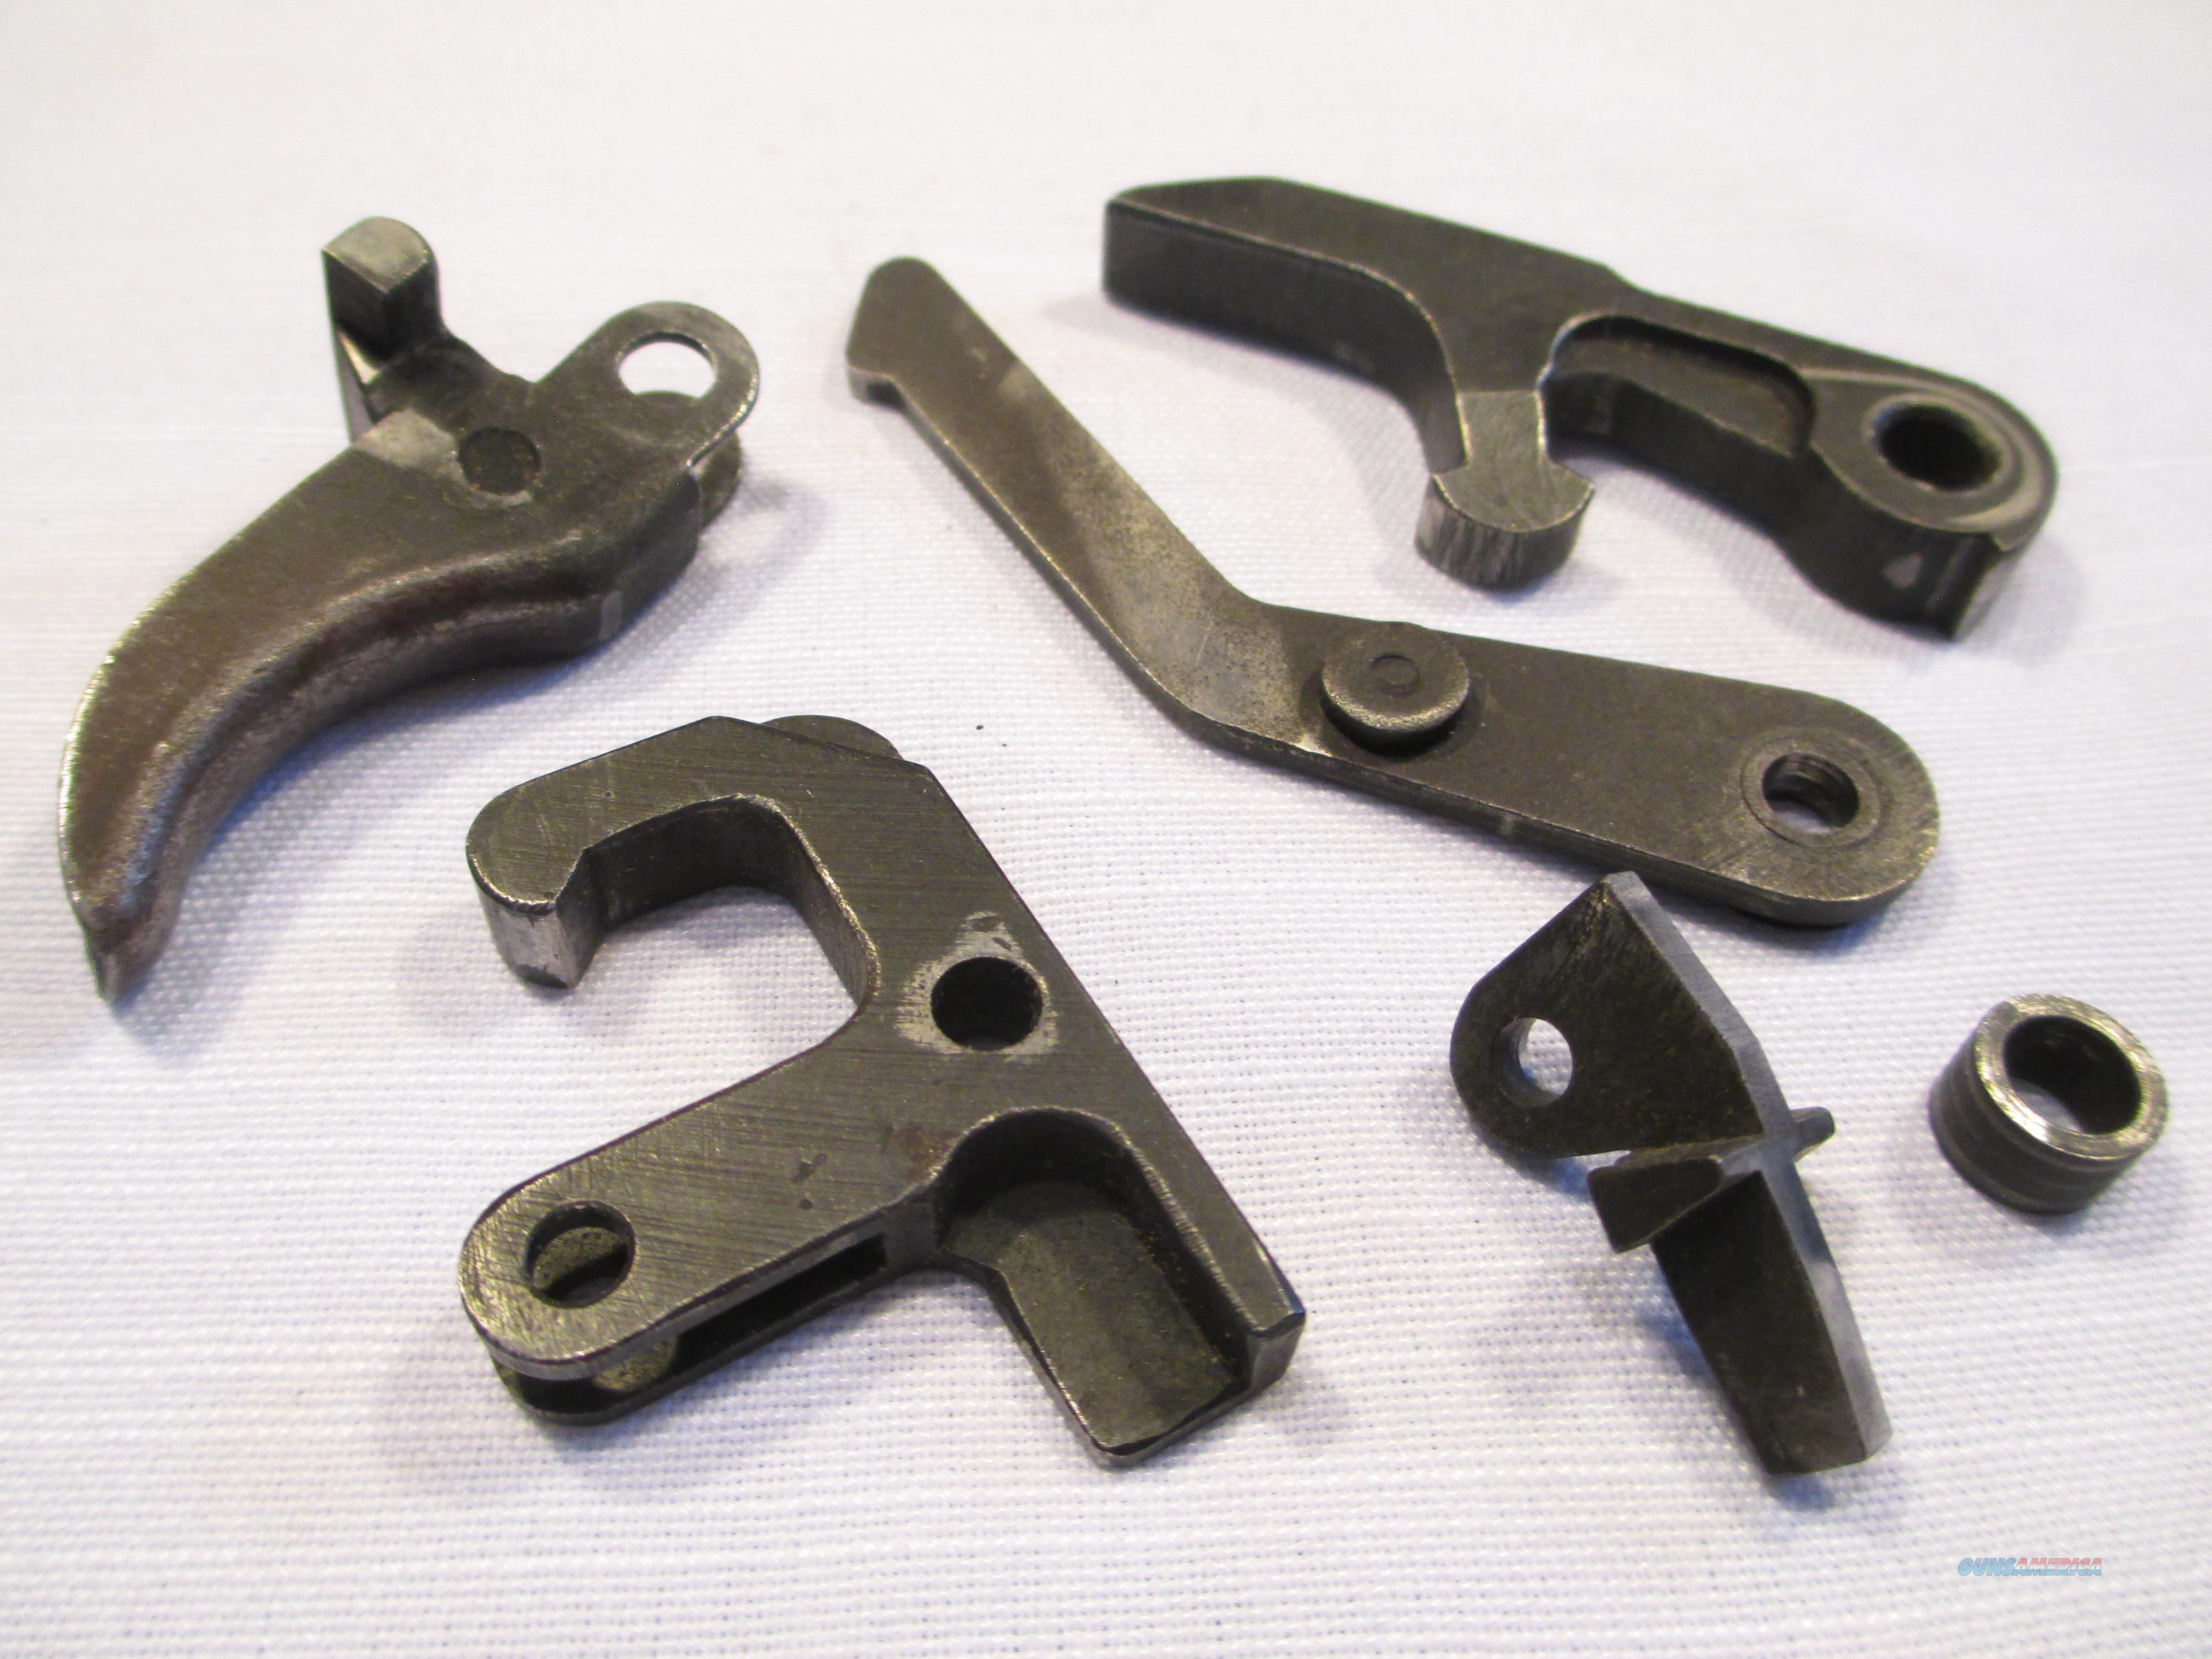 CETME 6 PART SET  Non-Guns > Gun Parts > Military - Foreign